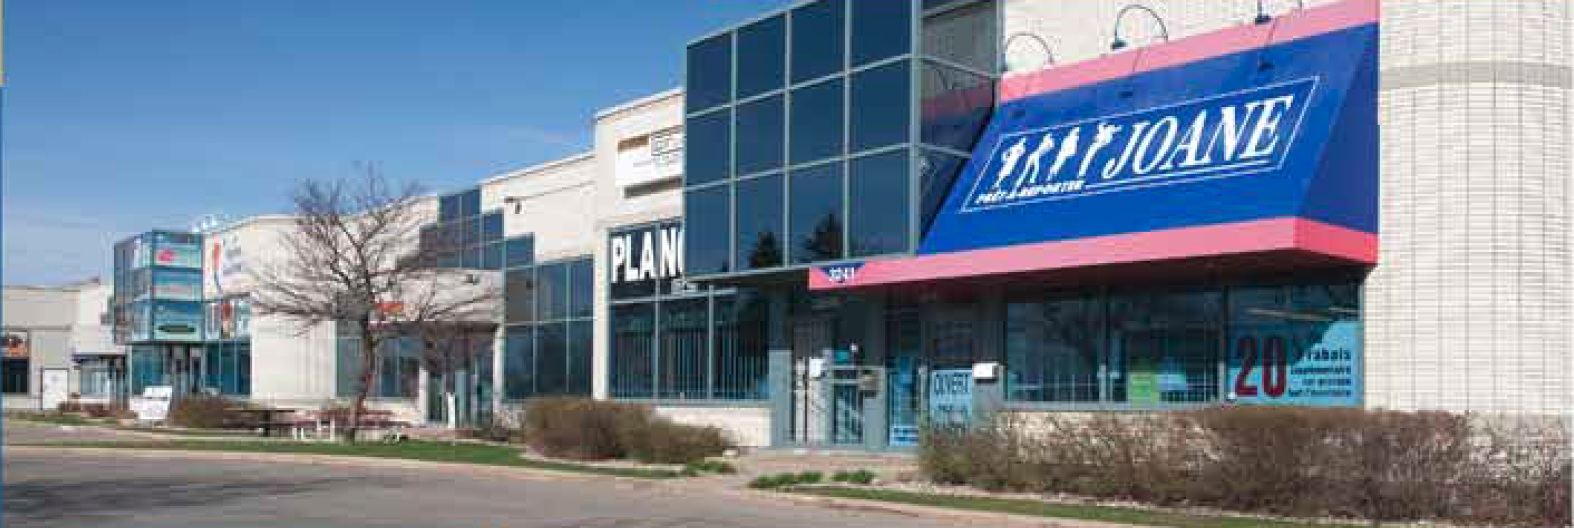 3225-3285 Jean-Béraud Avenue, Laval, Québec